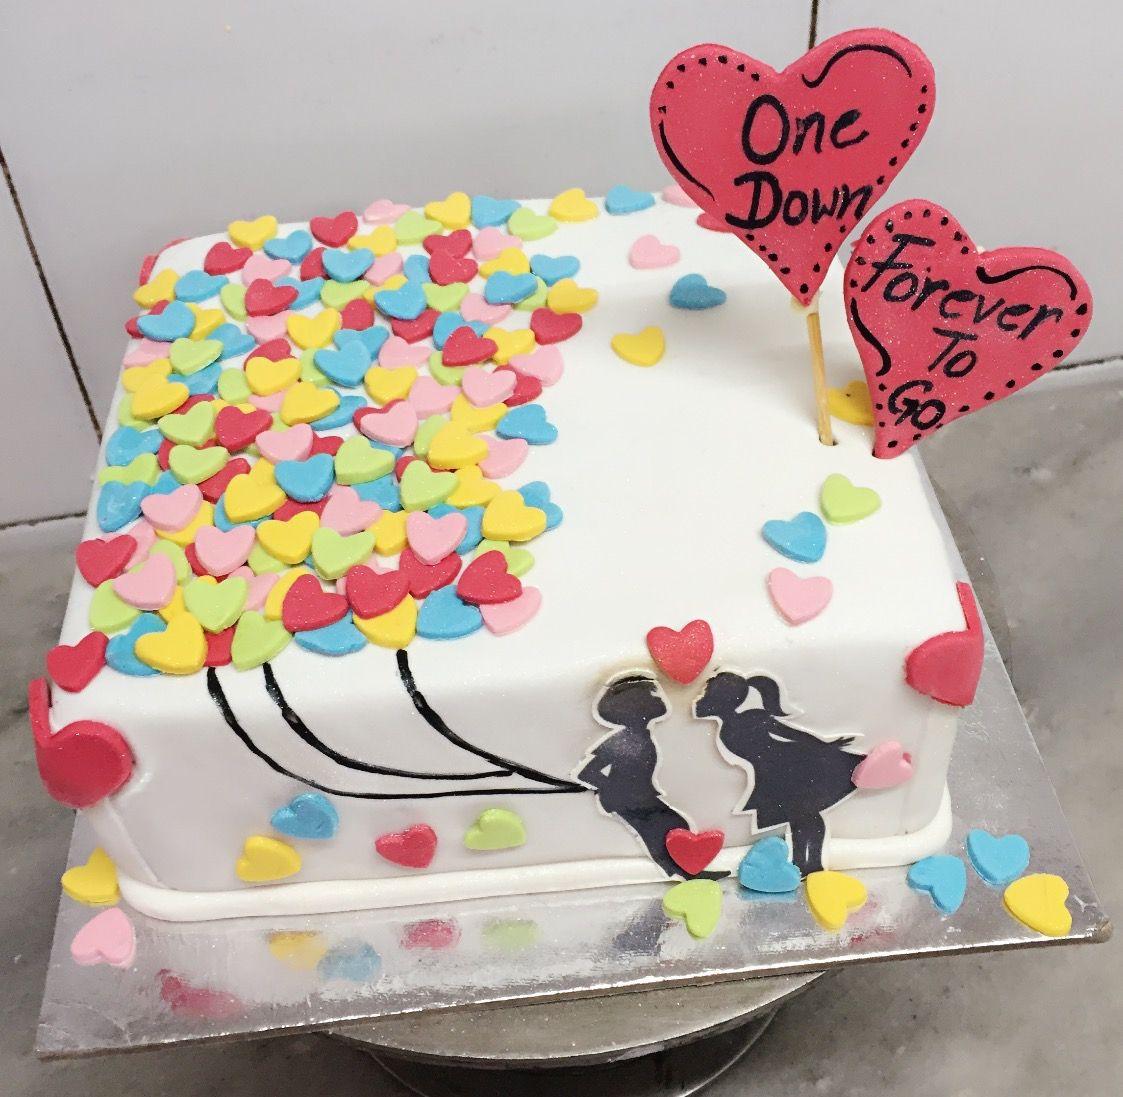 Cute 1st Anniversary Cake 1st anniversary cake